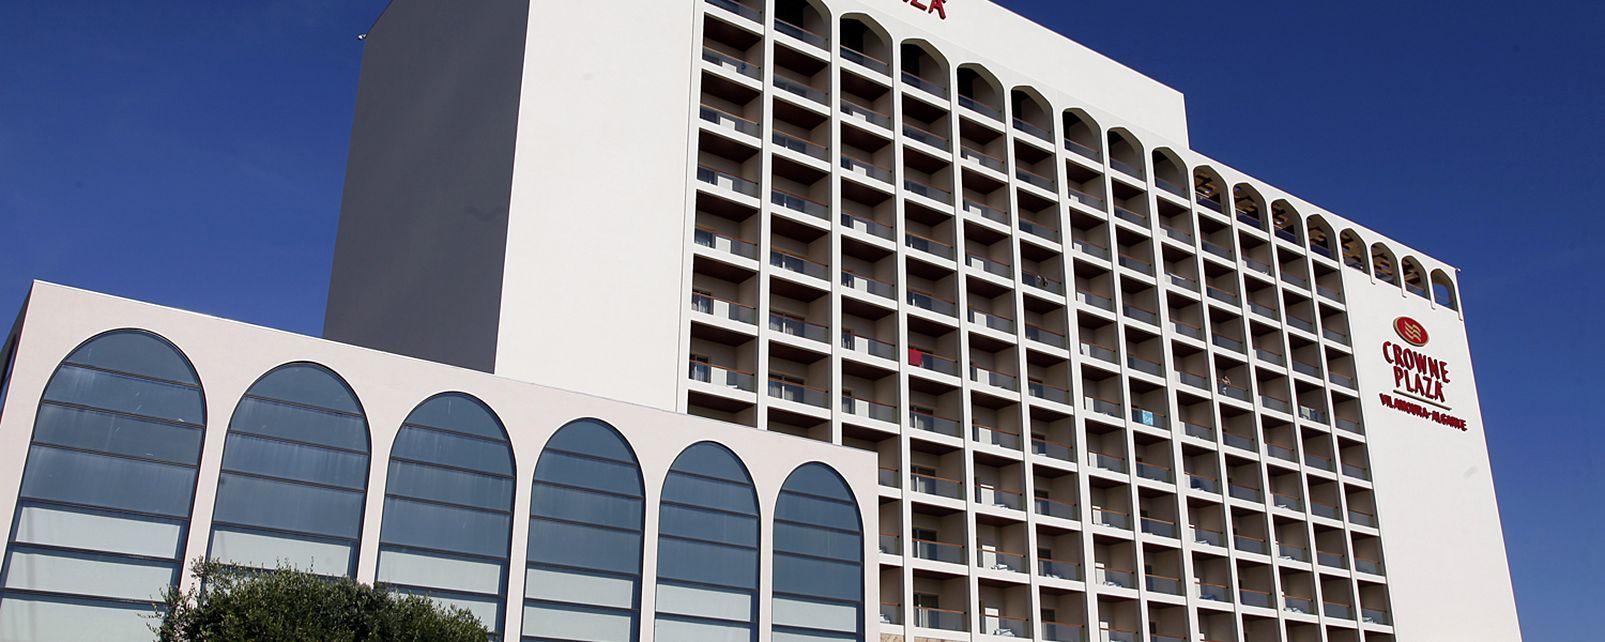 Hôtel Crowne Plaza Vilamoura